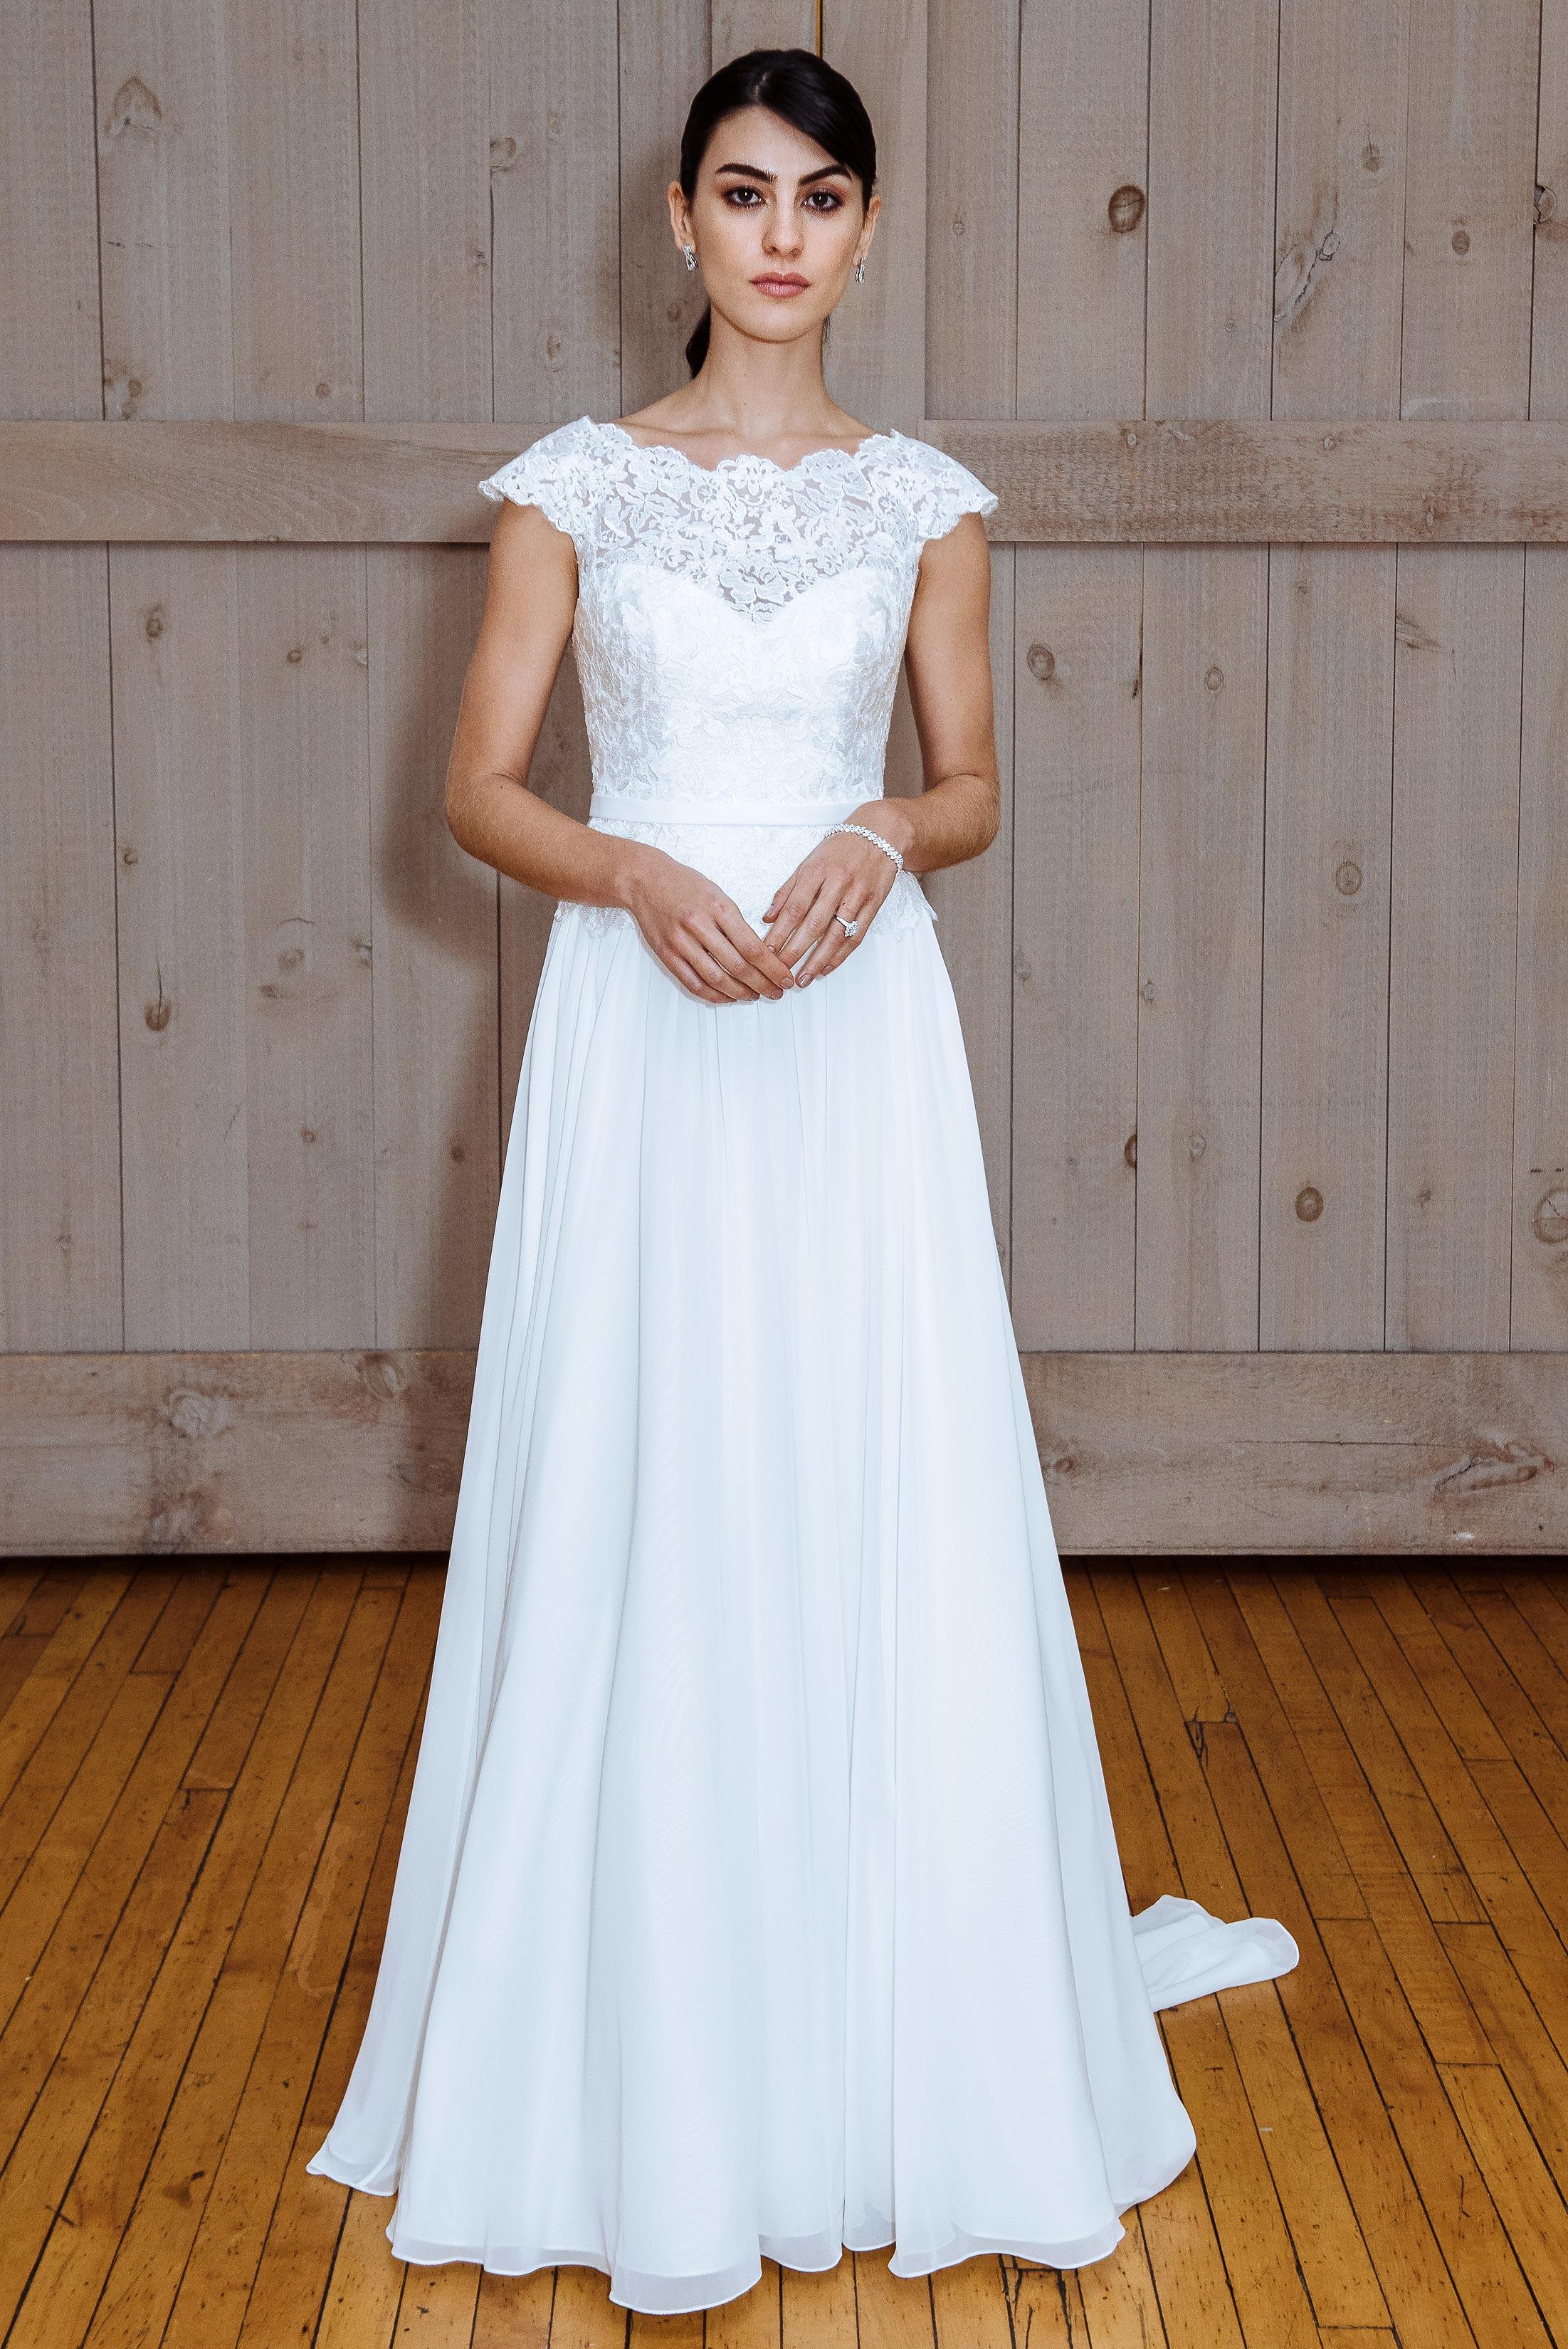 david's bridal cap sleeve a-line wedding dress spring 2018